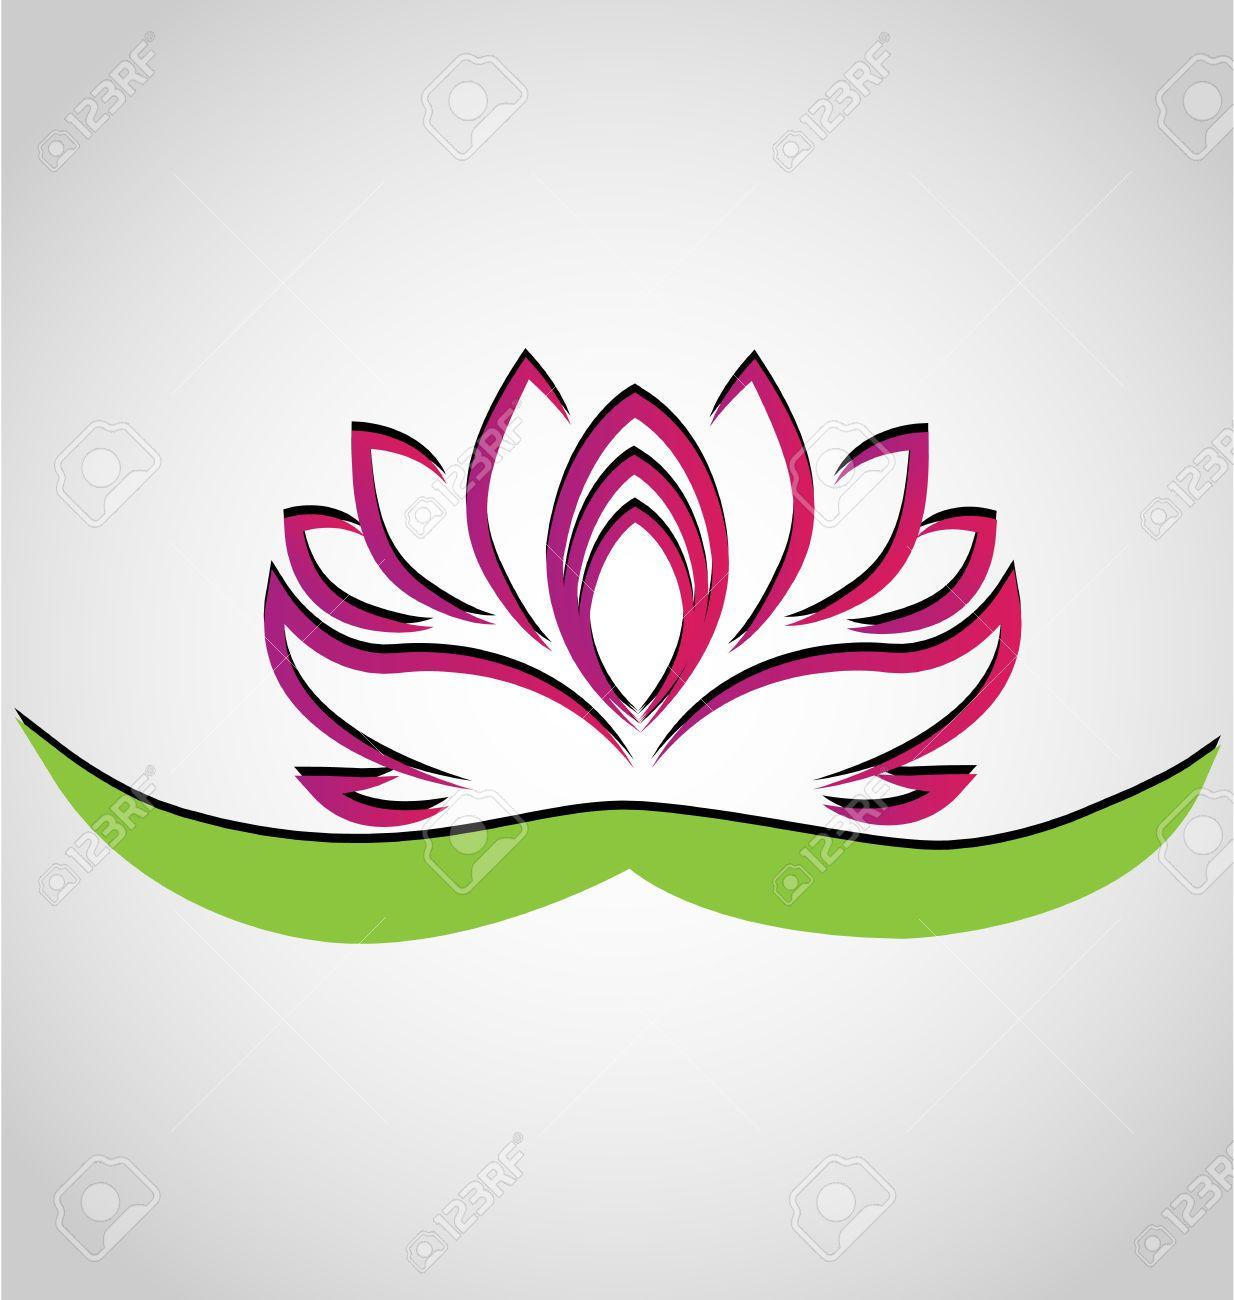 Simbolos budistas tatuagens pesquisa google logo ideas simbolos budistas tatuagens pesquisa google yoga symbolssymbol tattooslotus flowerslogo biocorpaavc Image collections